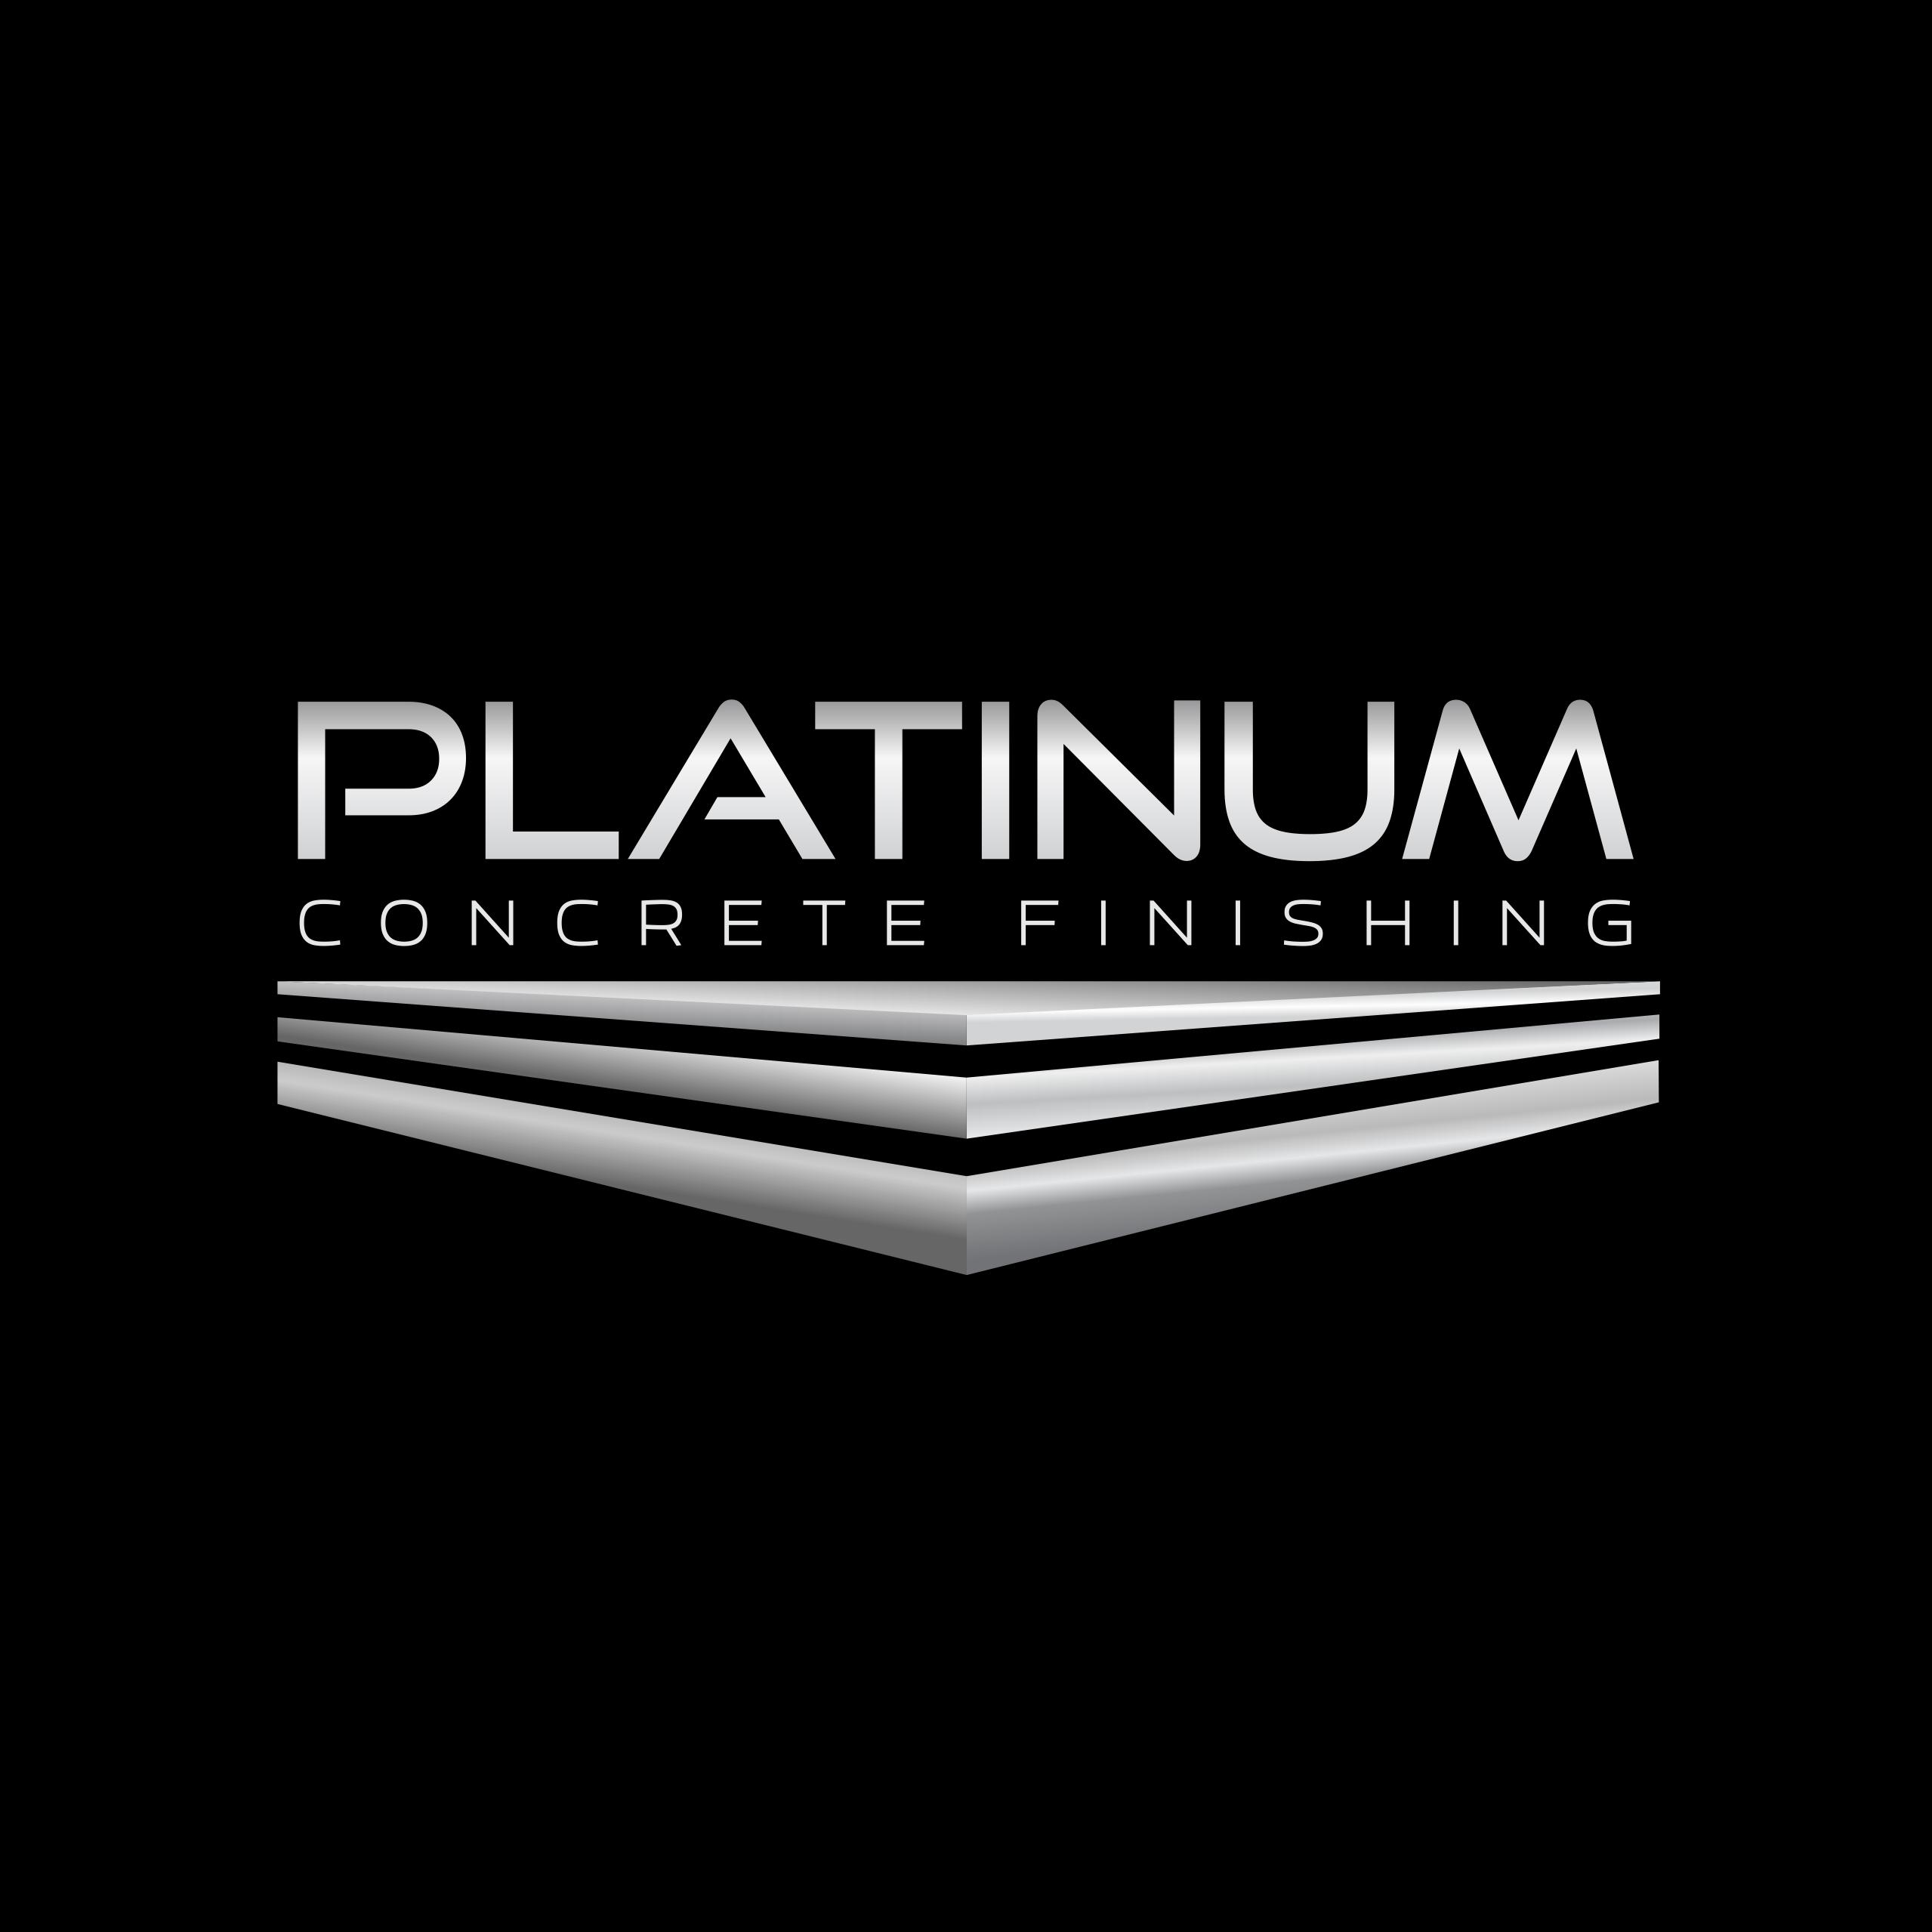 Concrete floor finishing needs powerful design